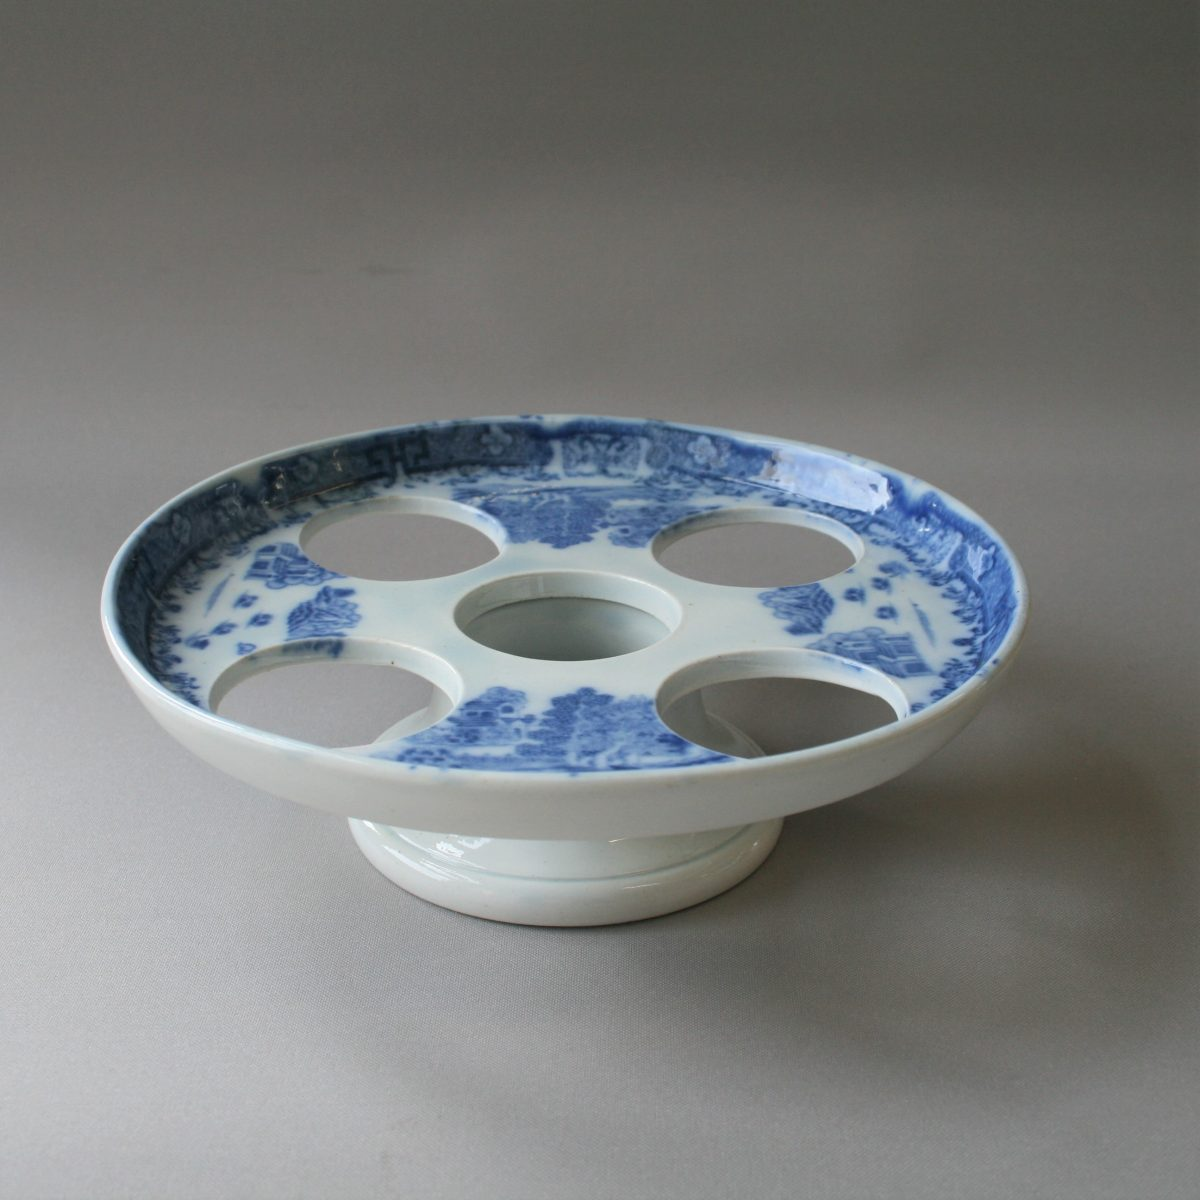 blue and white pottery egg holder/williamsantiques